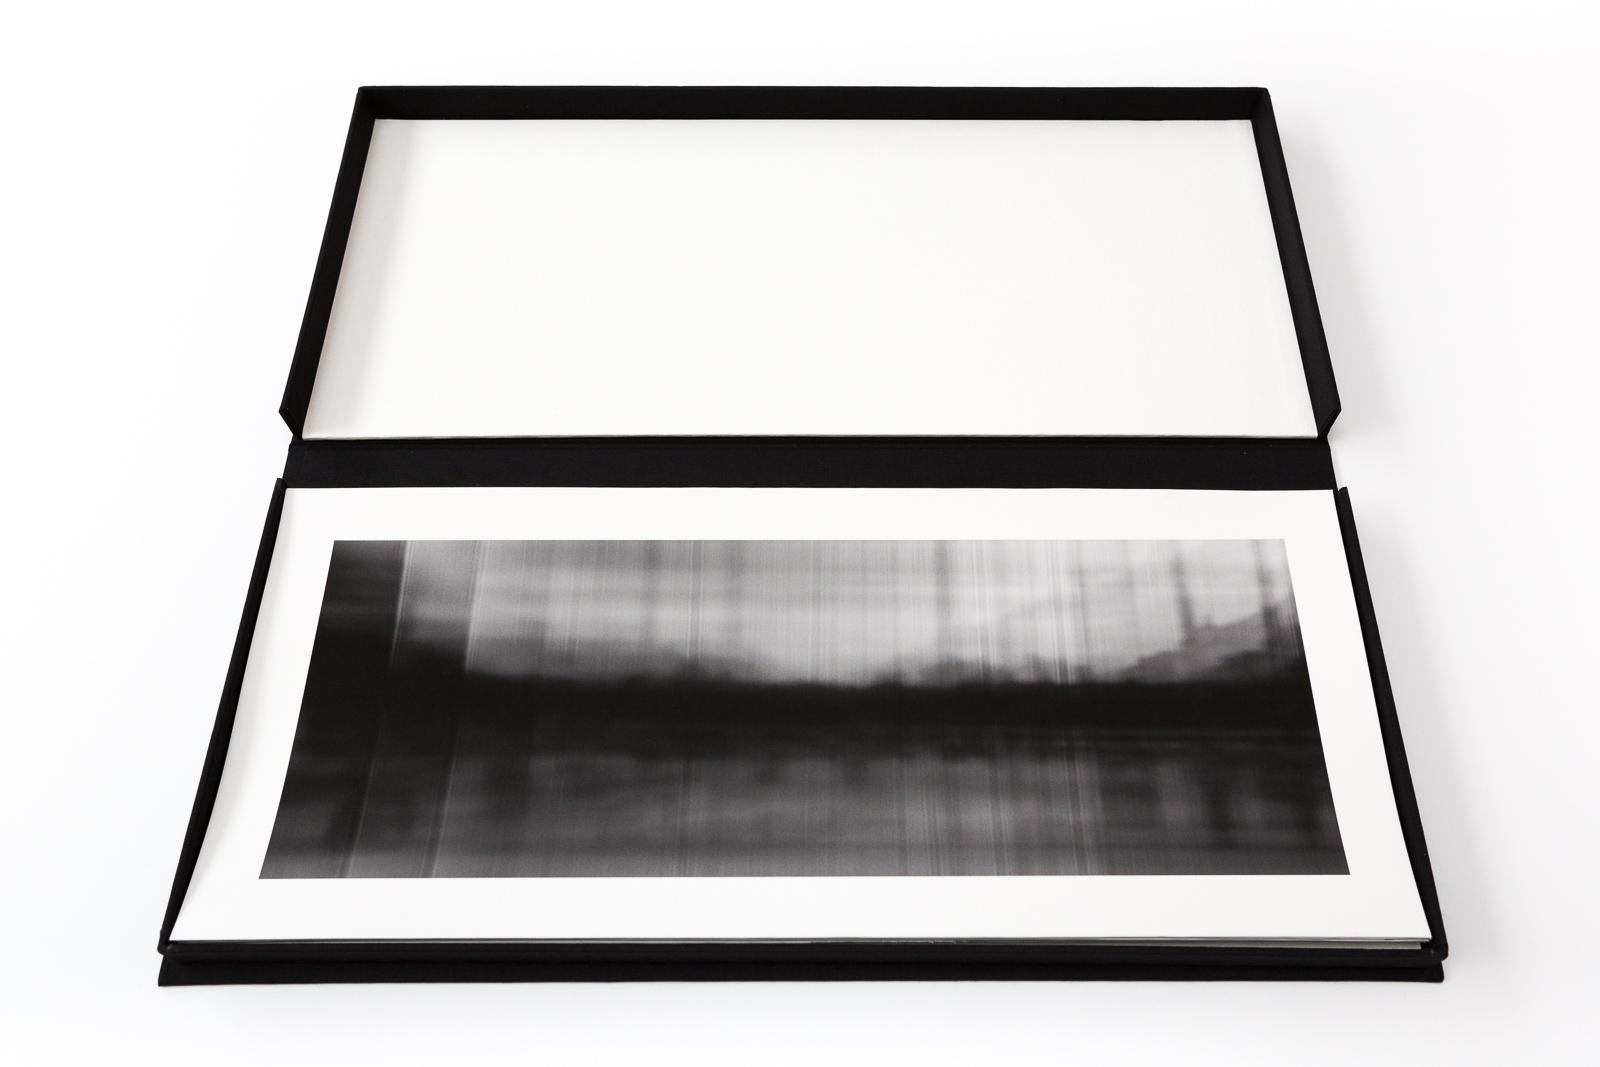 Karl Burke 1916 Elements of an Insurrection Portfolio Box-2.jpg